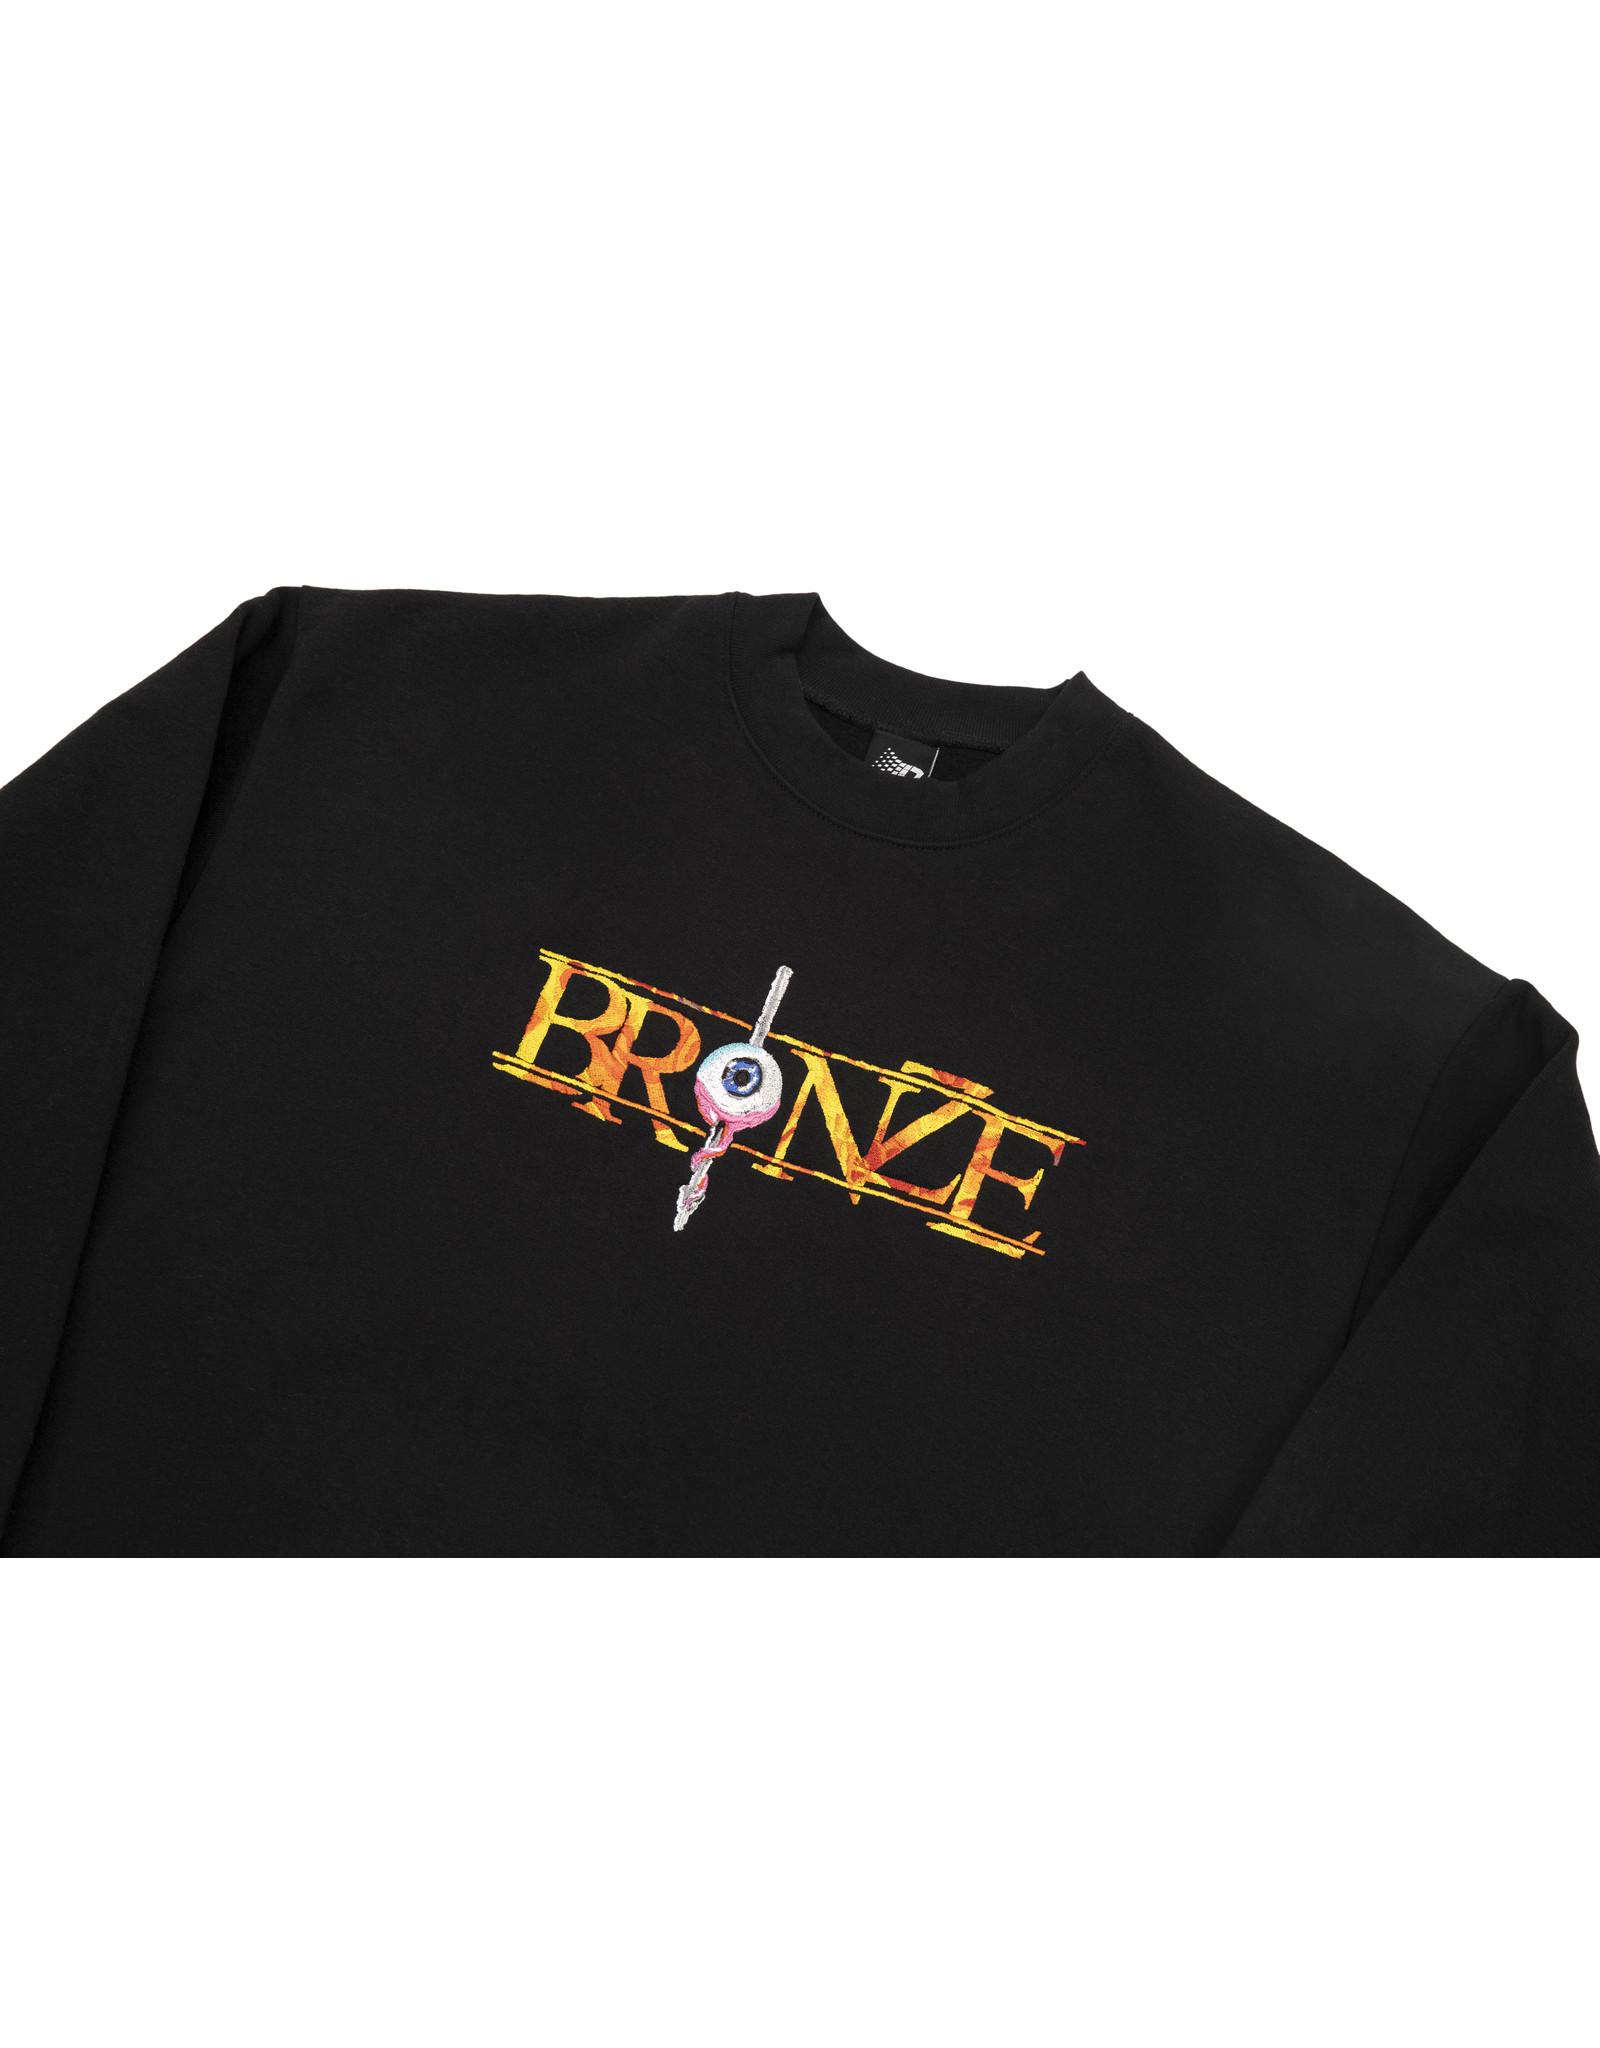 Bronze56K Always Hard Embroidered Crewneck - Black